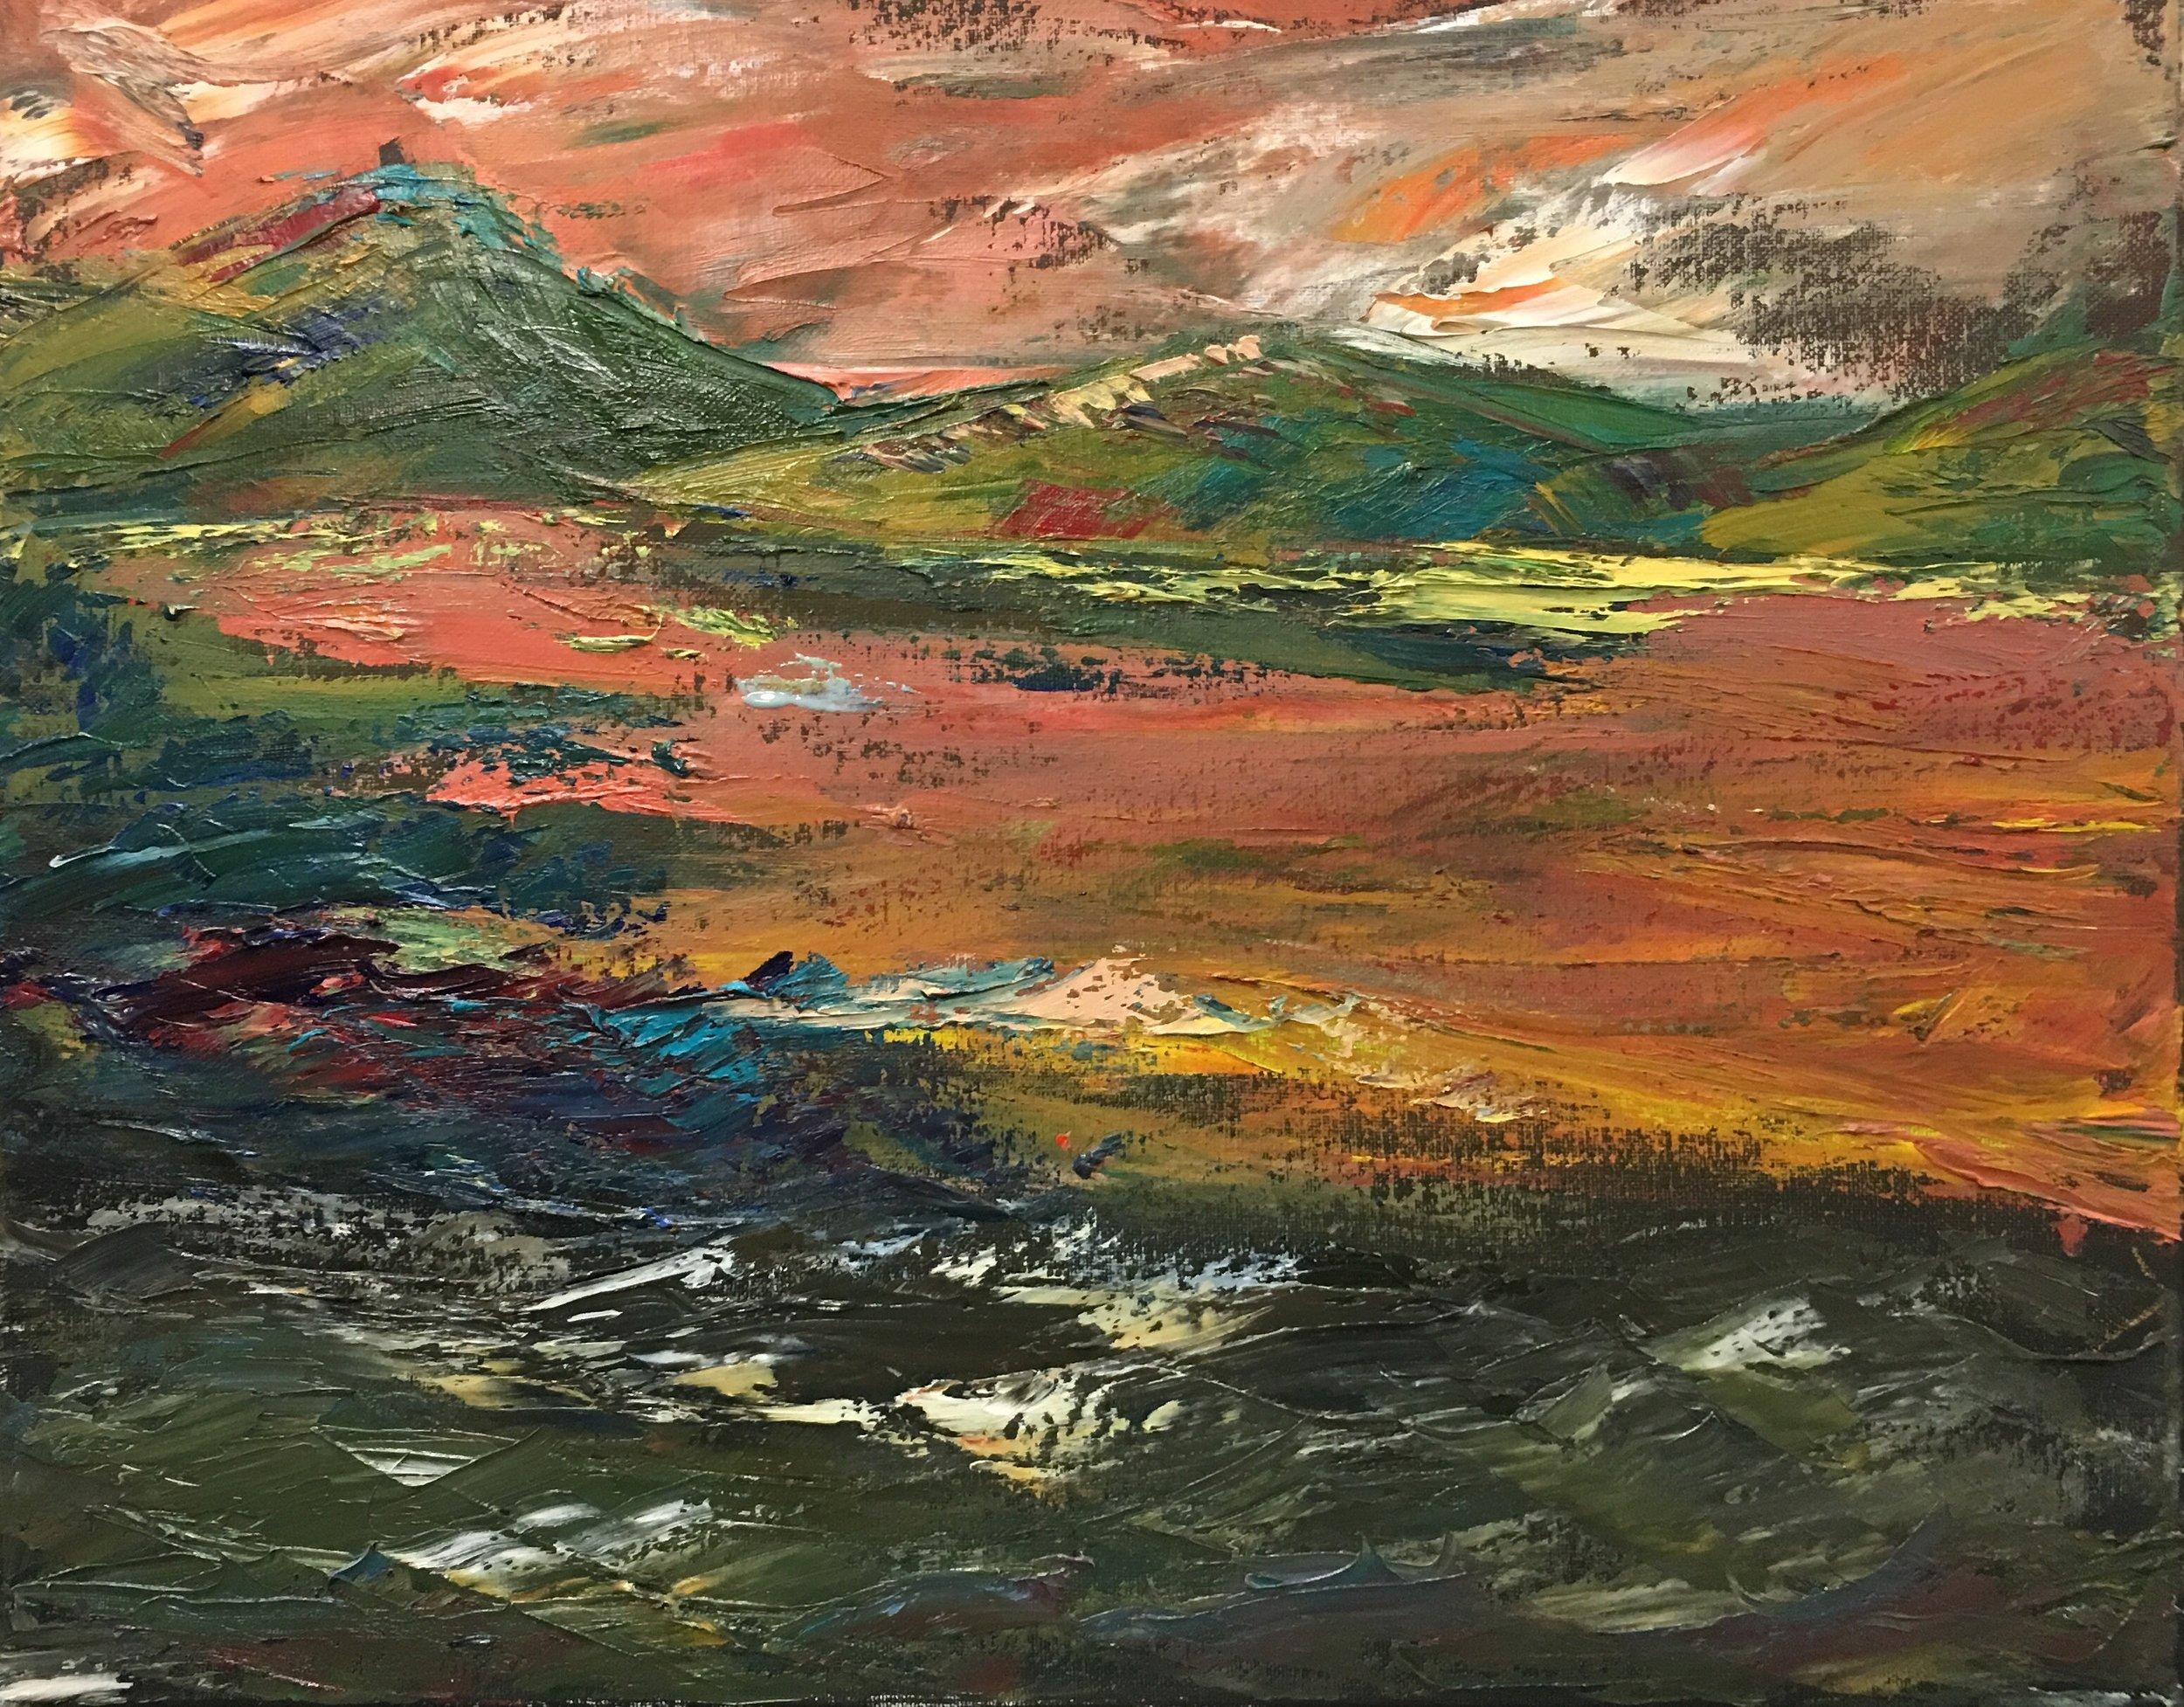 Artwork title: Norway Impression Artist: Fan Lu ( Oil on canvas, 14x18  inch)